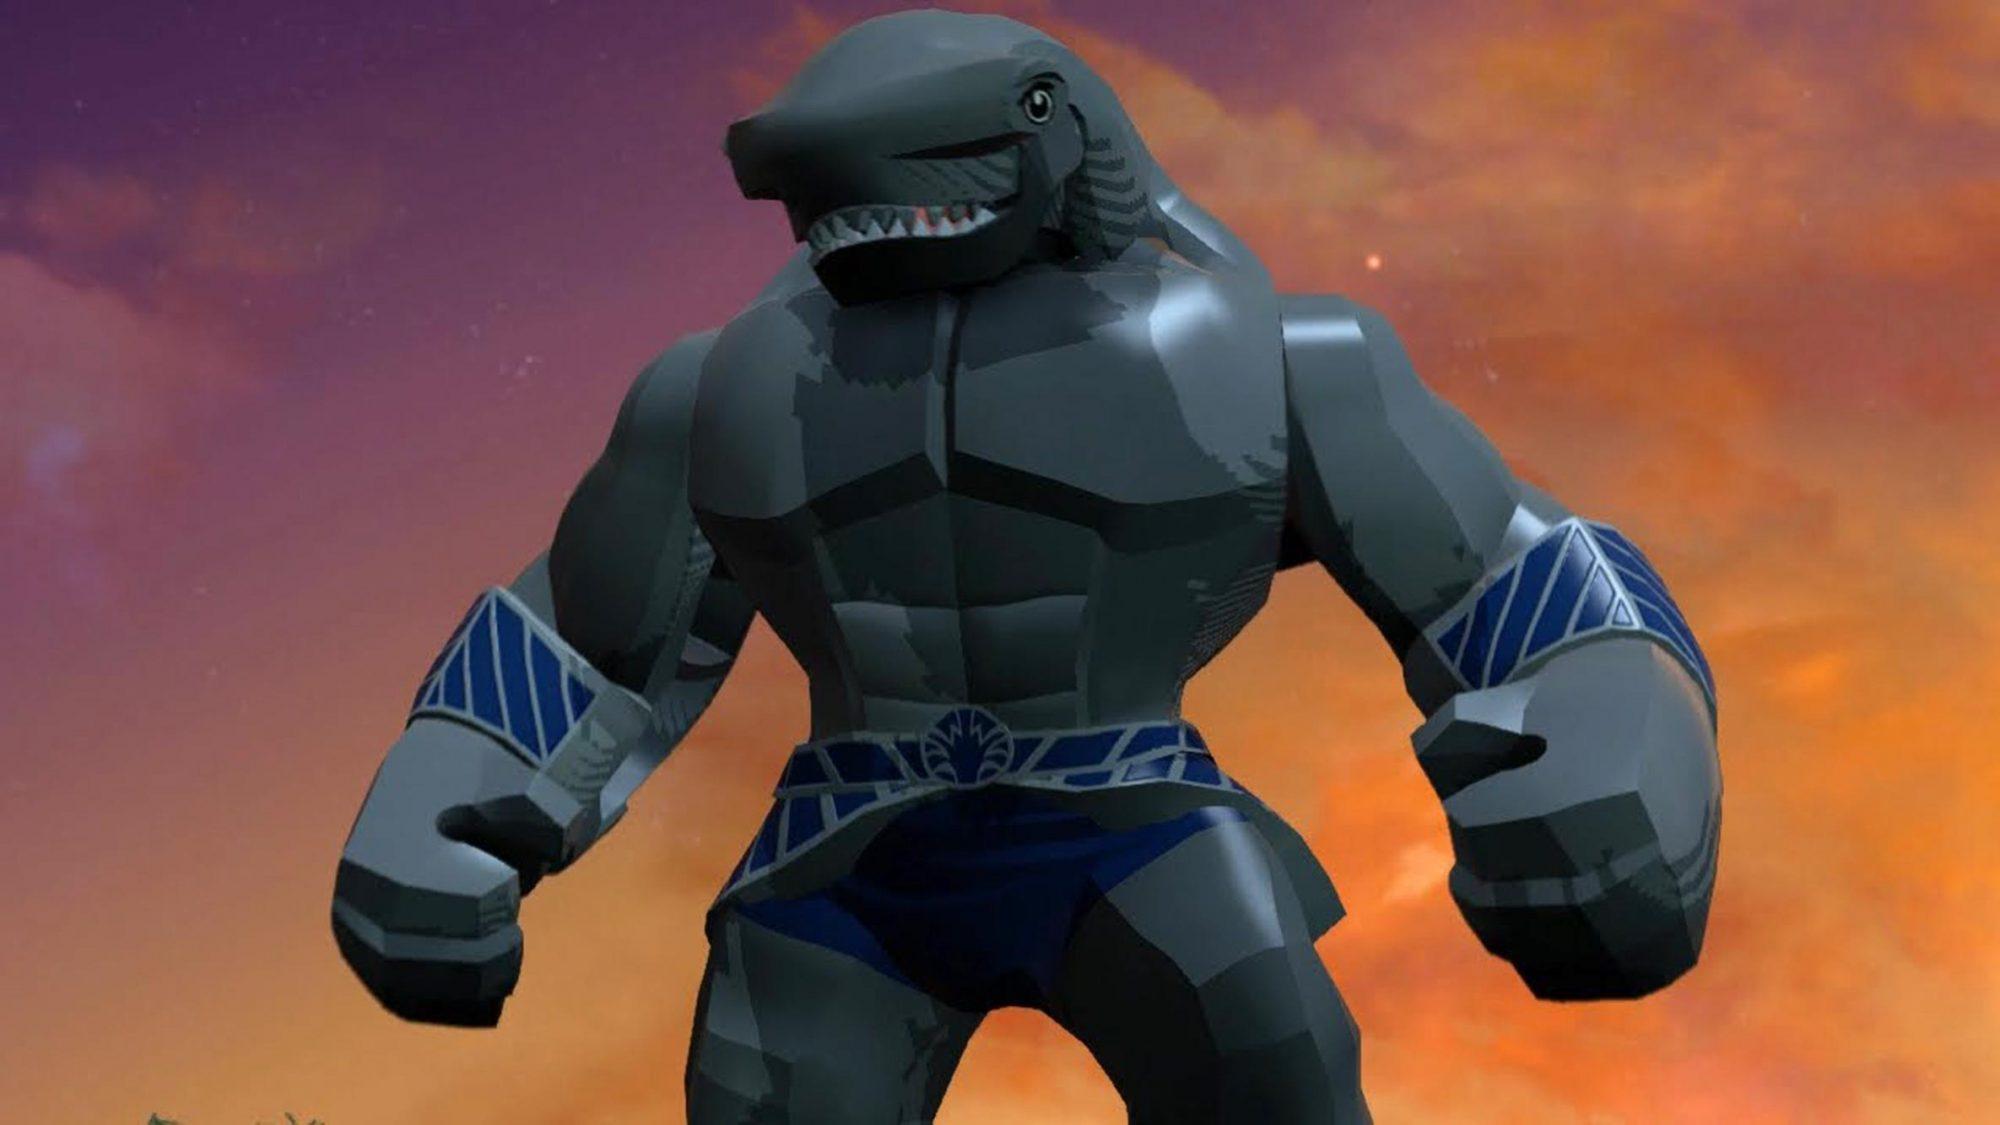 King Shark in Lego Batman 3: Beyond Gotham video game